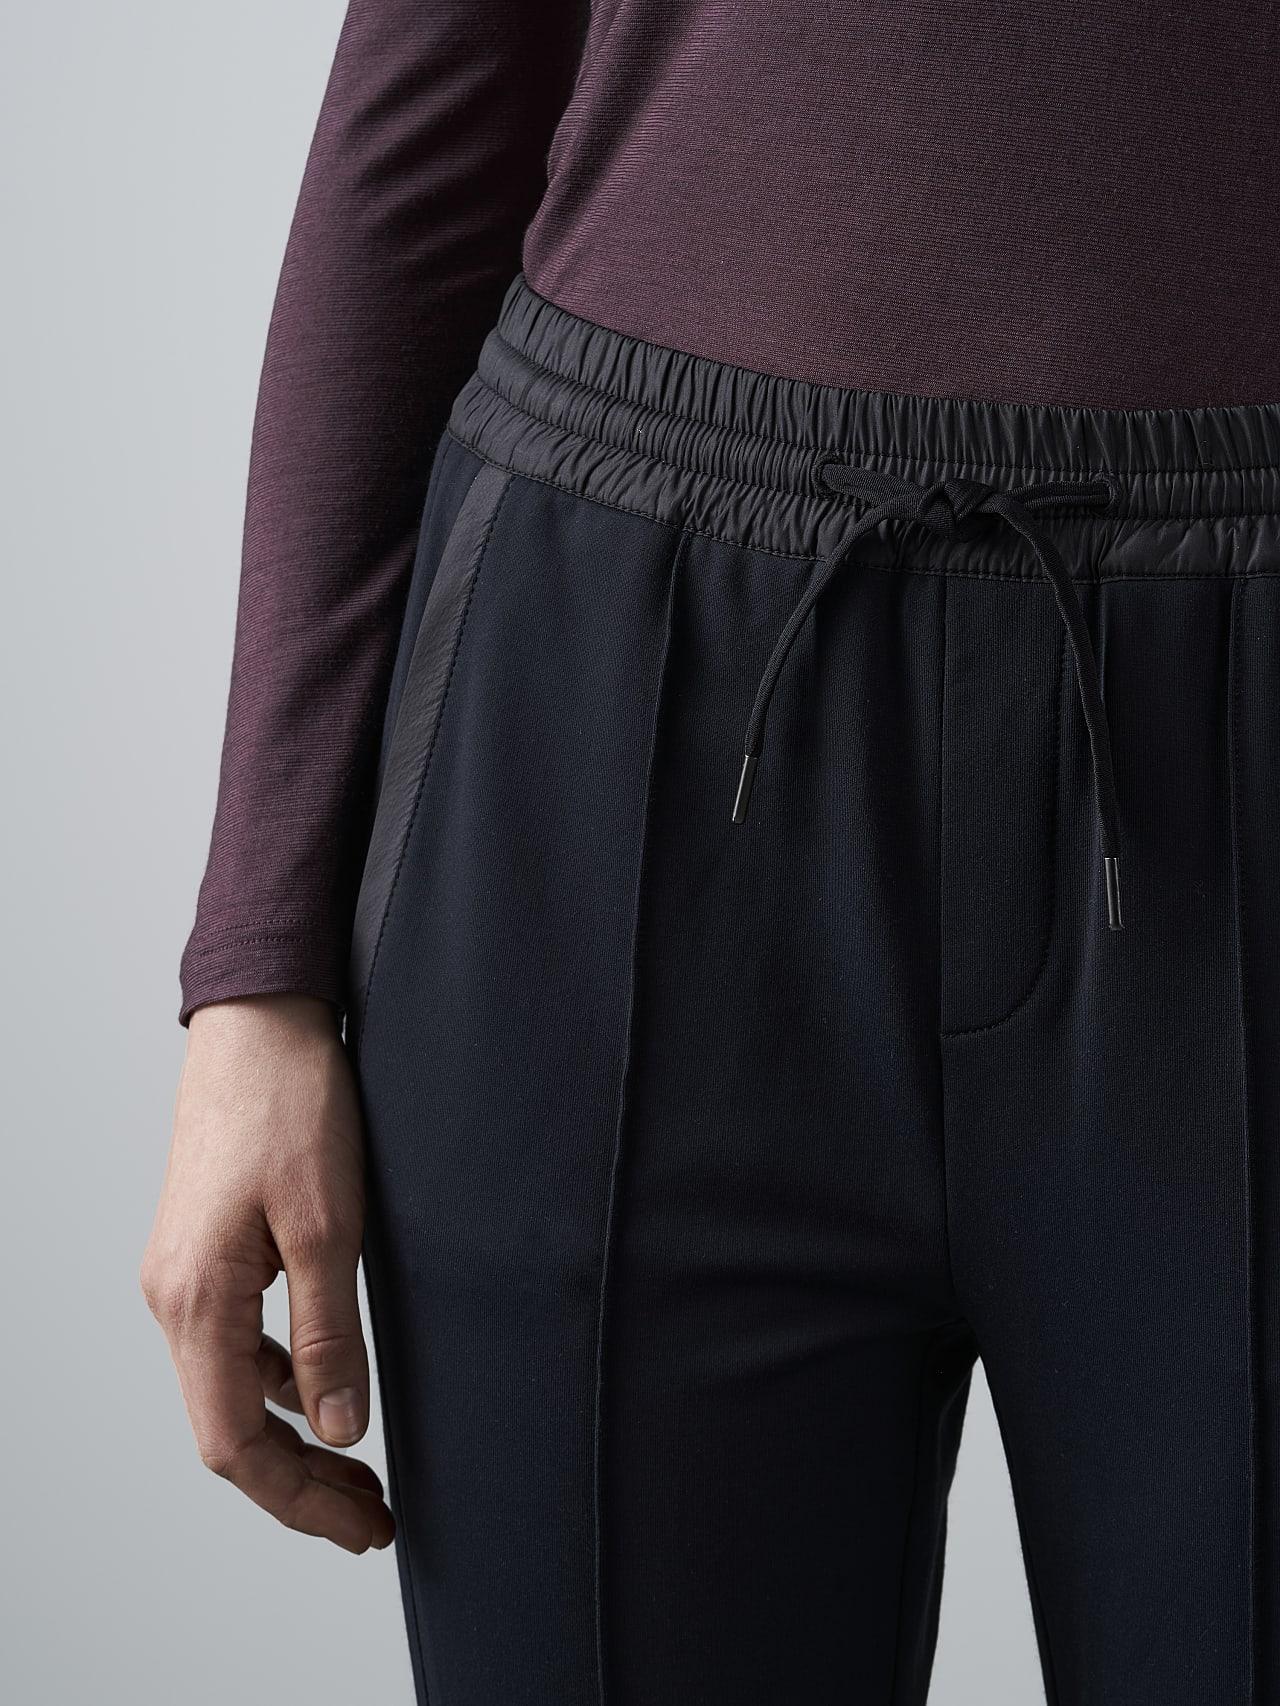 PANTA V1.Y4.02 Cropped Pants black Right Alpha Tauri